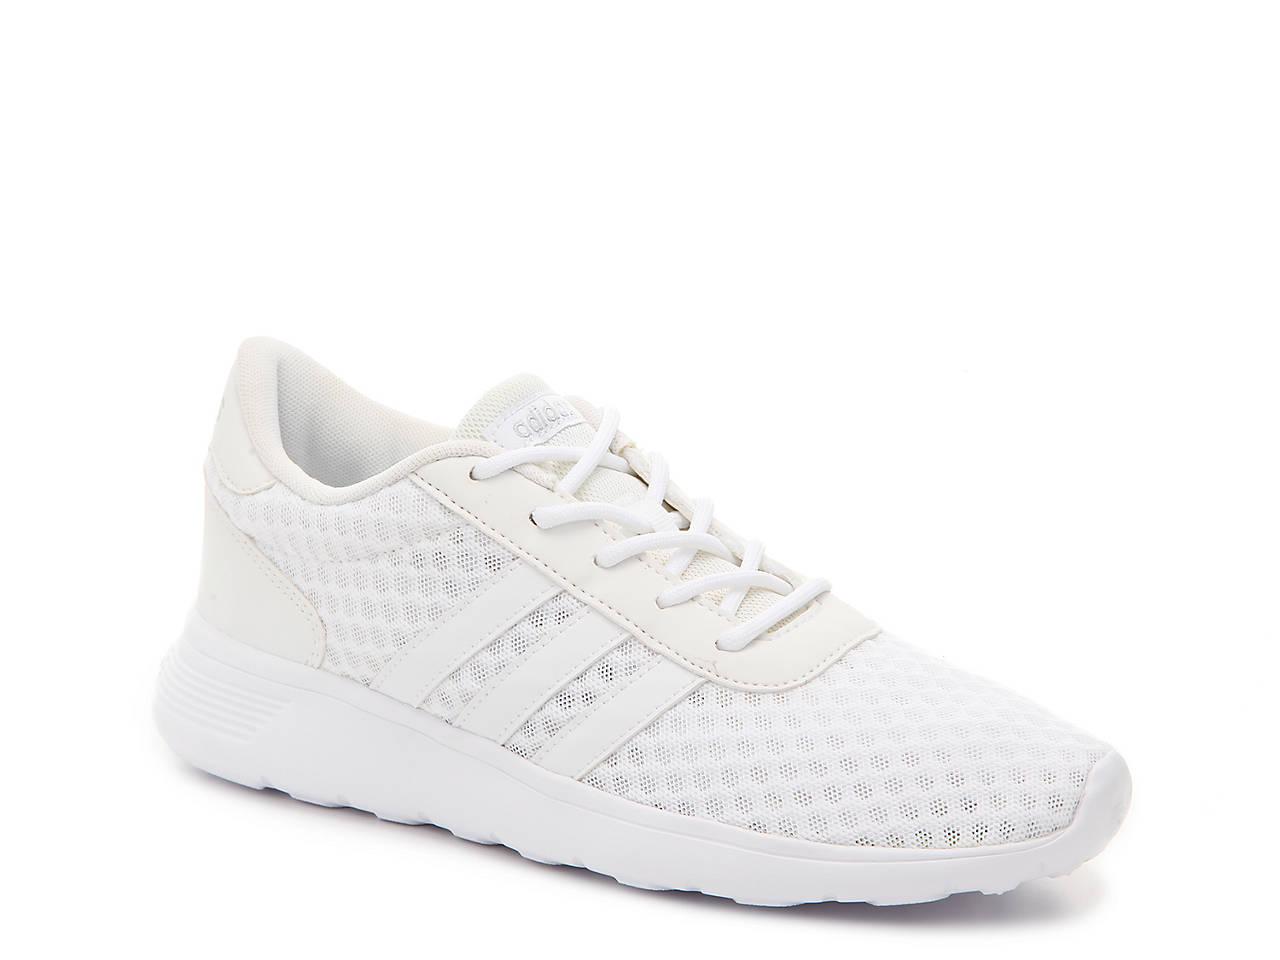 a6dcc3208be adidas Lite Racer Mesh Sneaker - Women's Women's Shoes | DSW